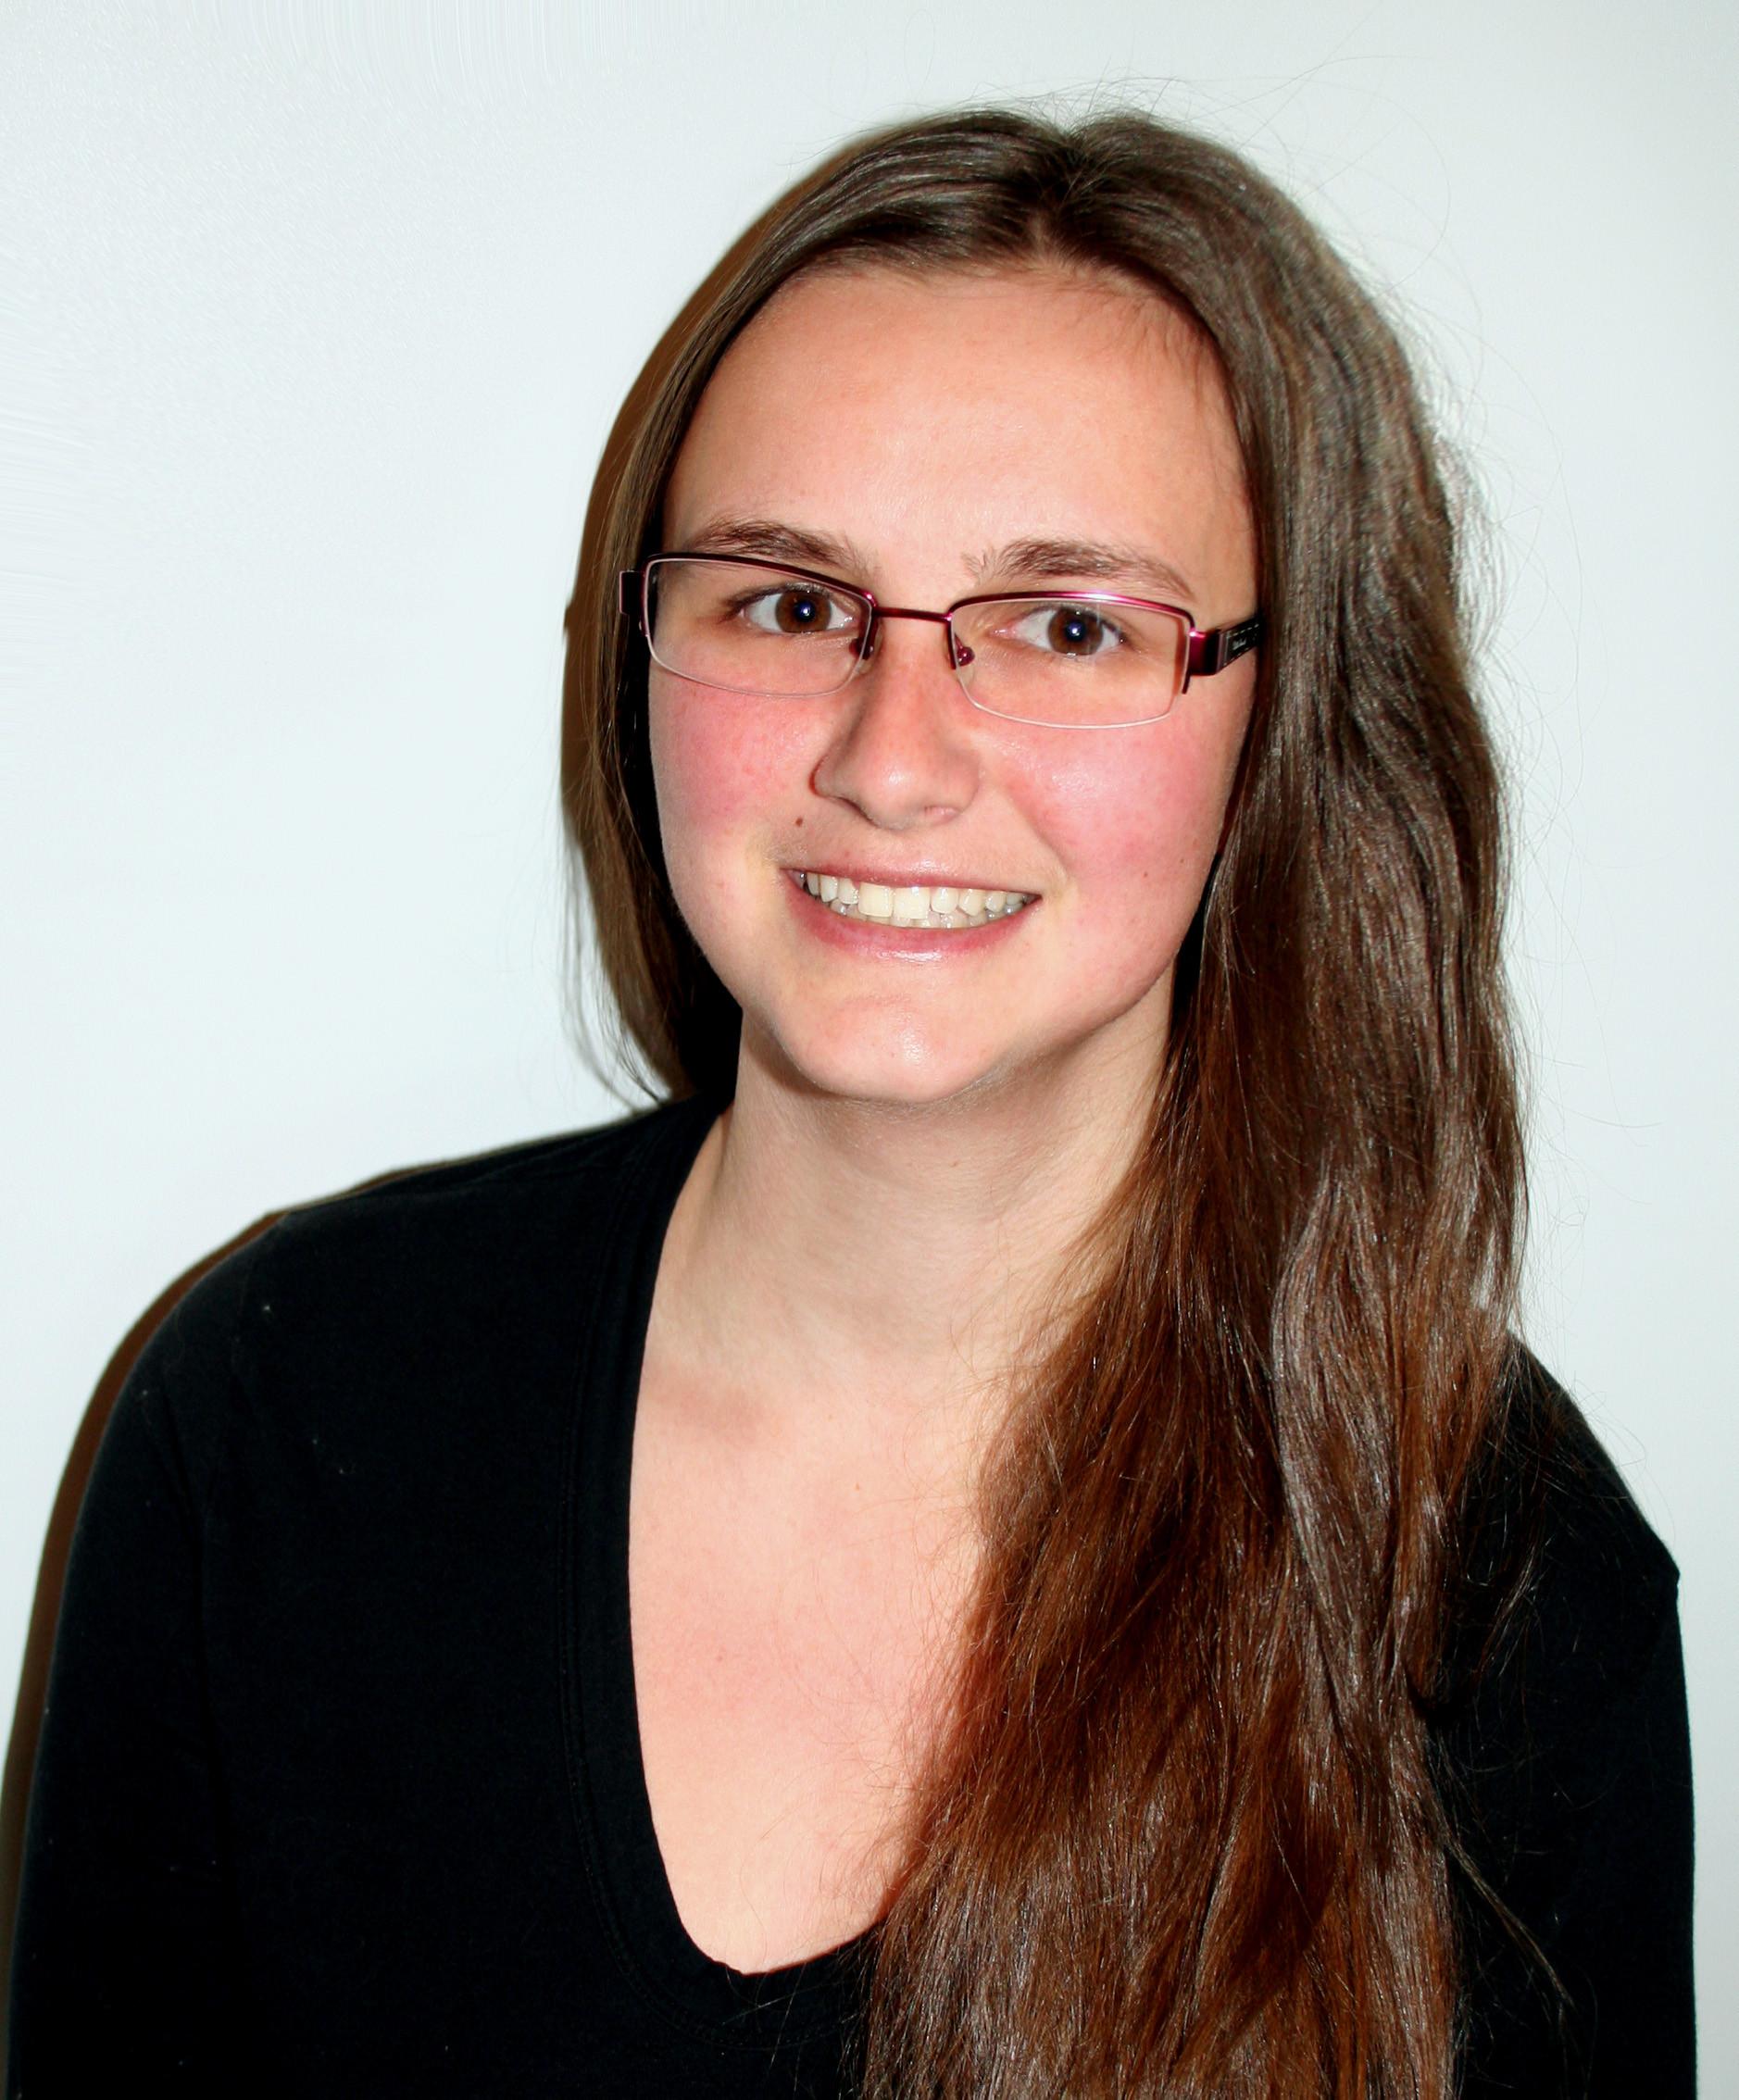 Stephanie Locke RMT